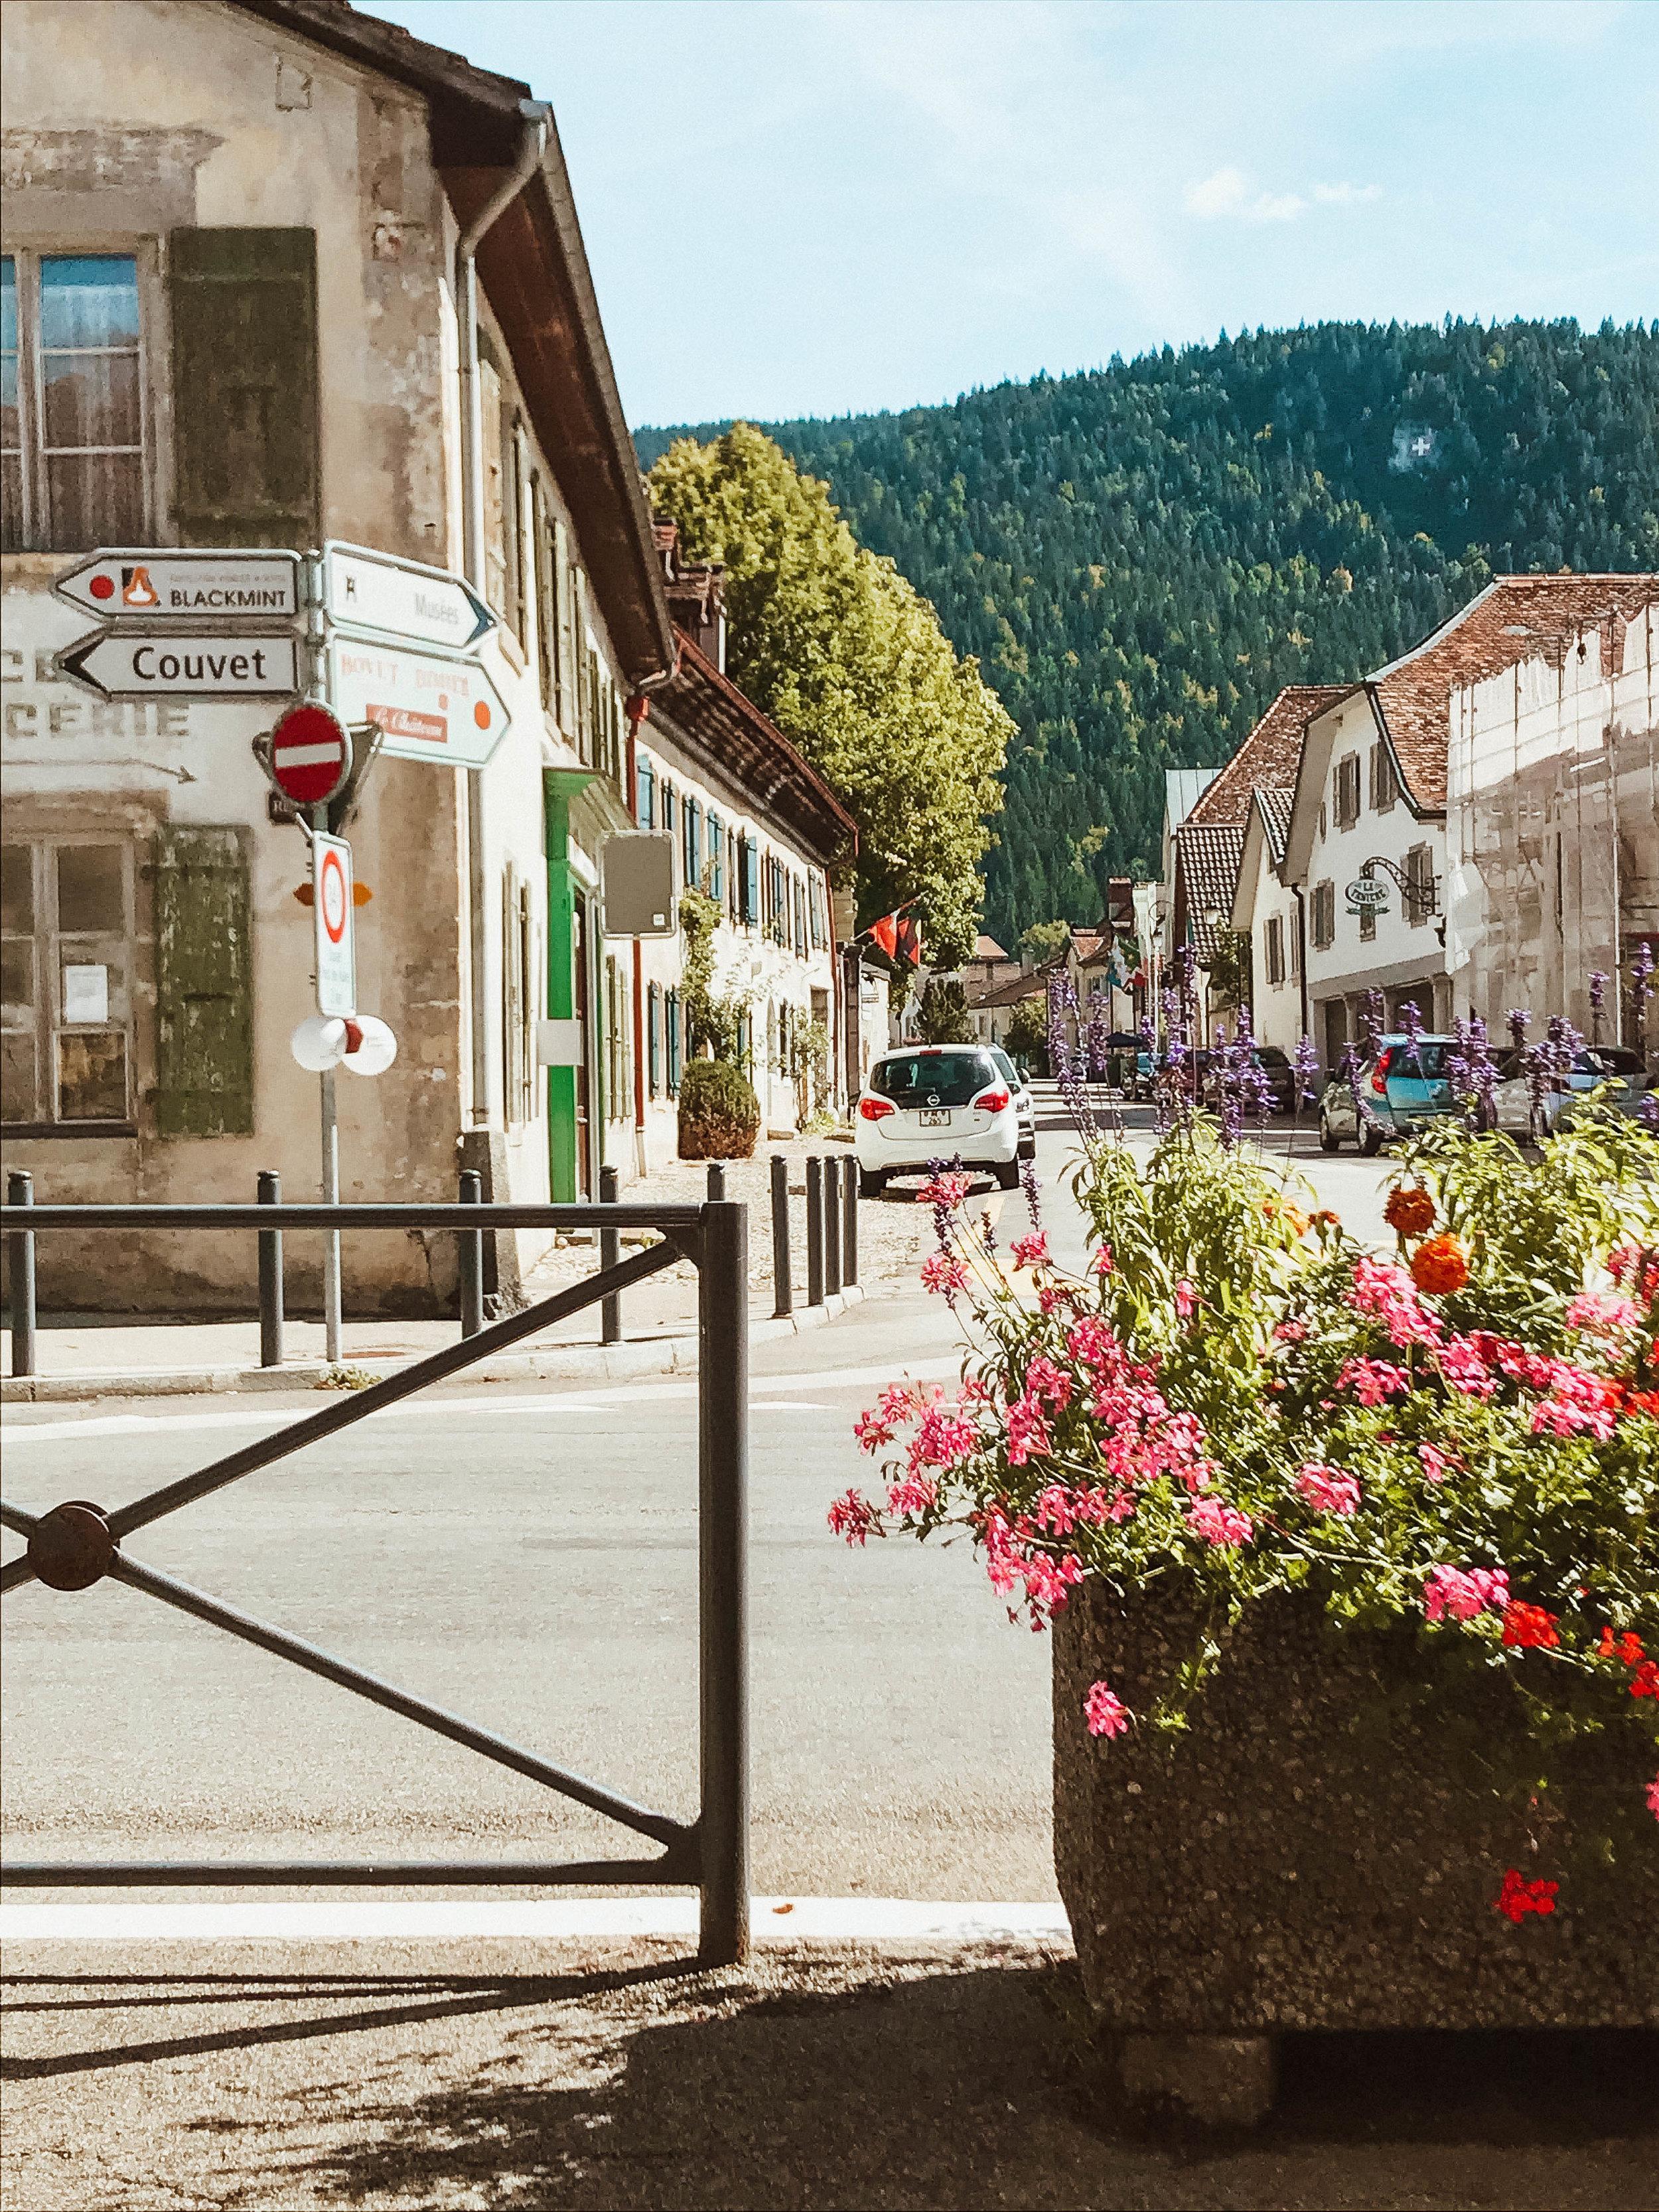 Main street in Motiers, Switzerland